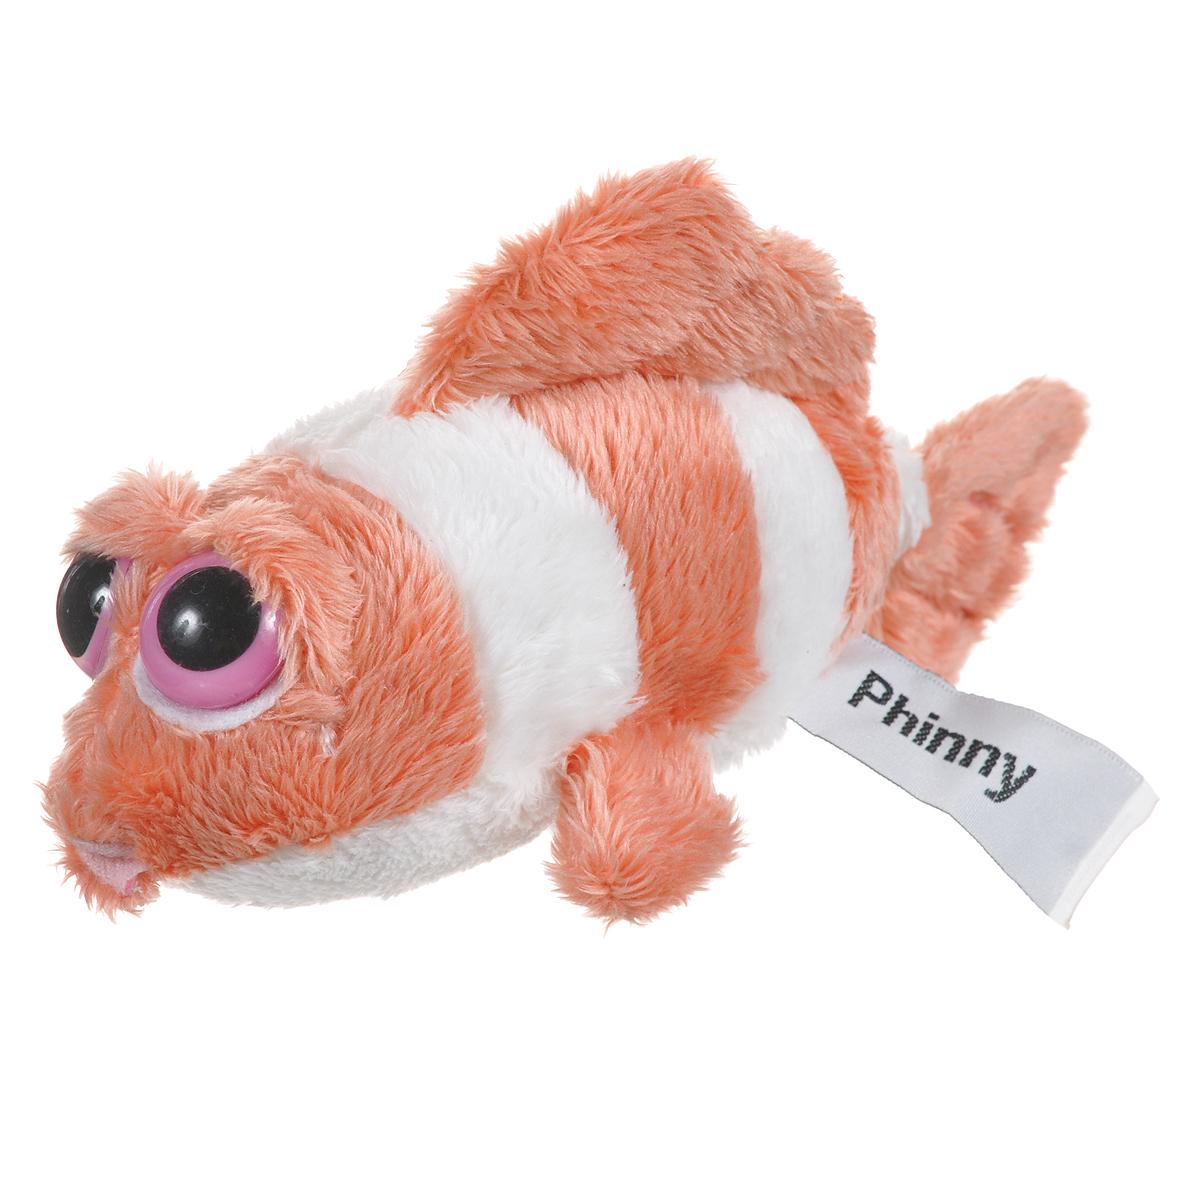 Мягкая игрушка Russ Рыба-клоун Пиперс, цвет: белый, оранжевый, 17 см joanna russ the female man